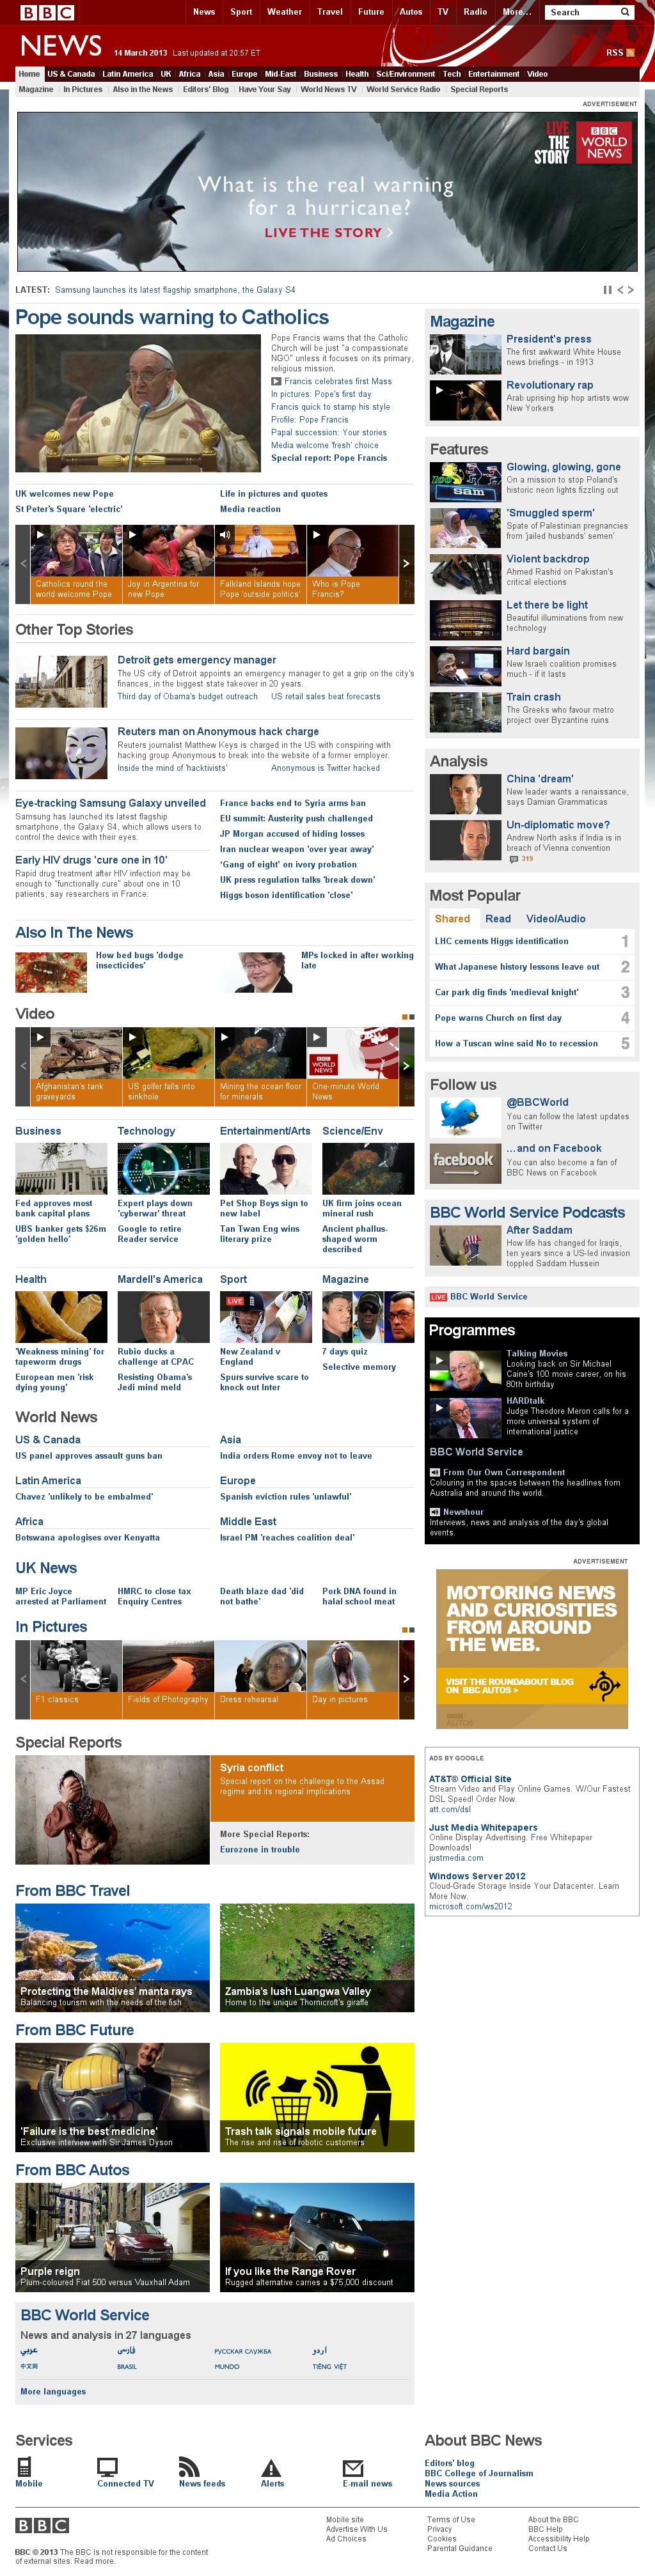 BBC at Friday March 15, 2013, 1:01 a.m. UTC